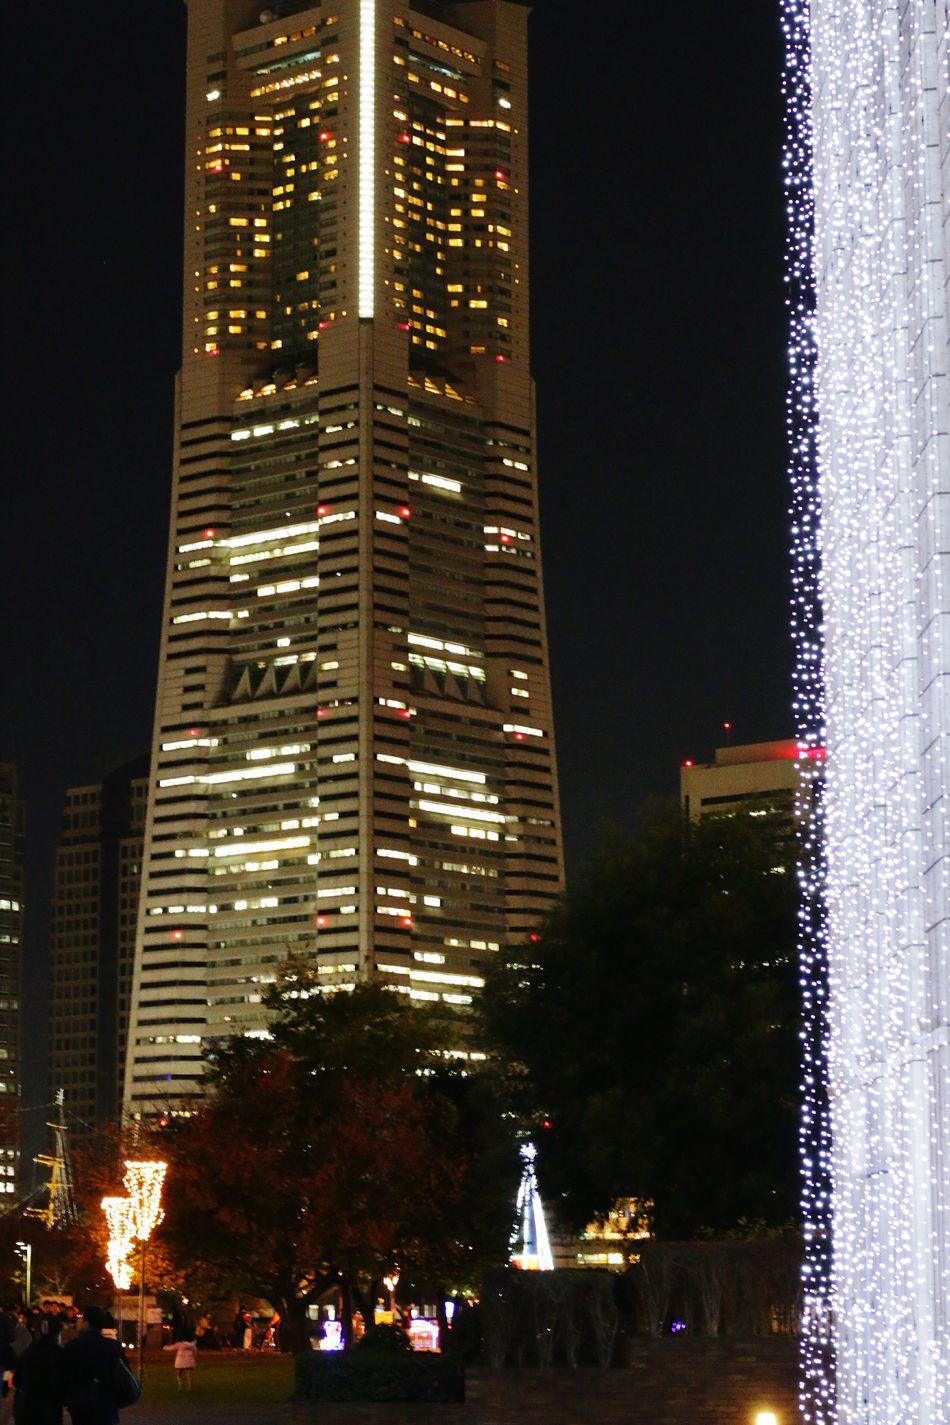 Yokohama キラキラ イルミネーション2015 横浜ランドマークタワー Illumination Japan Light